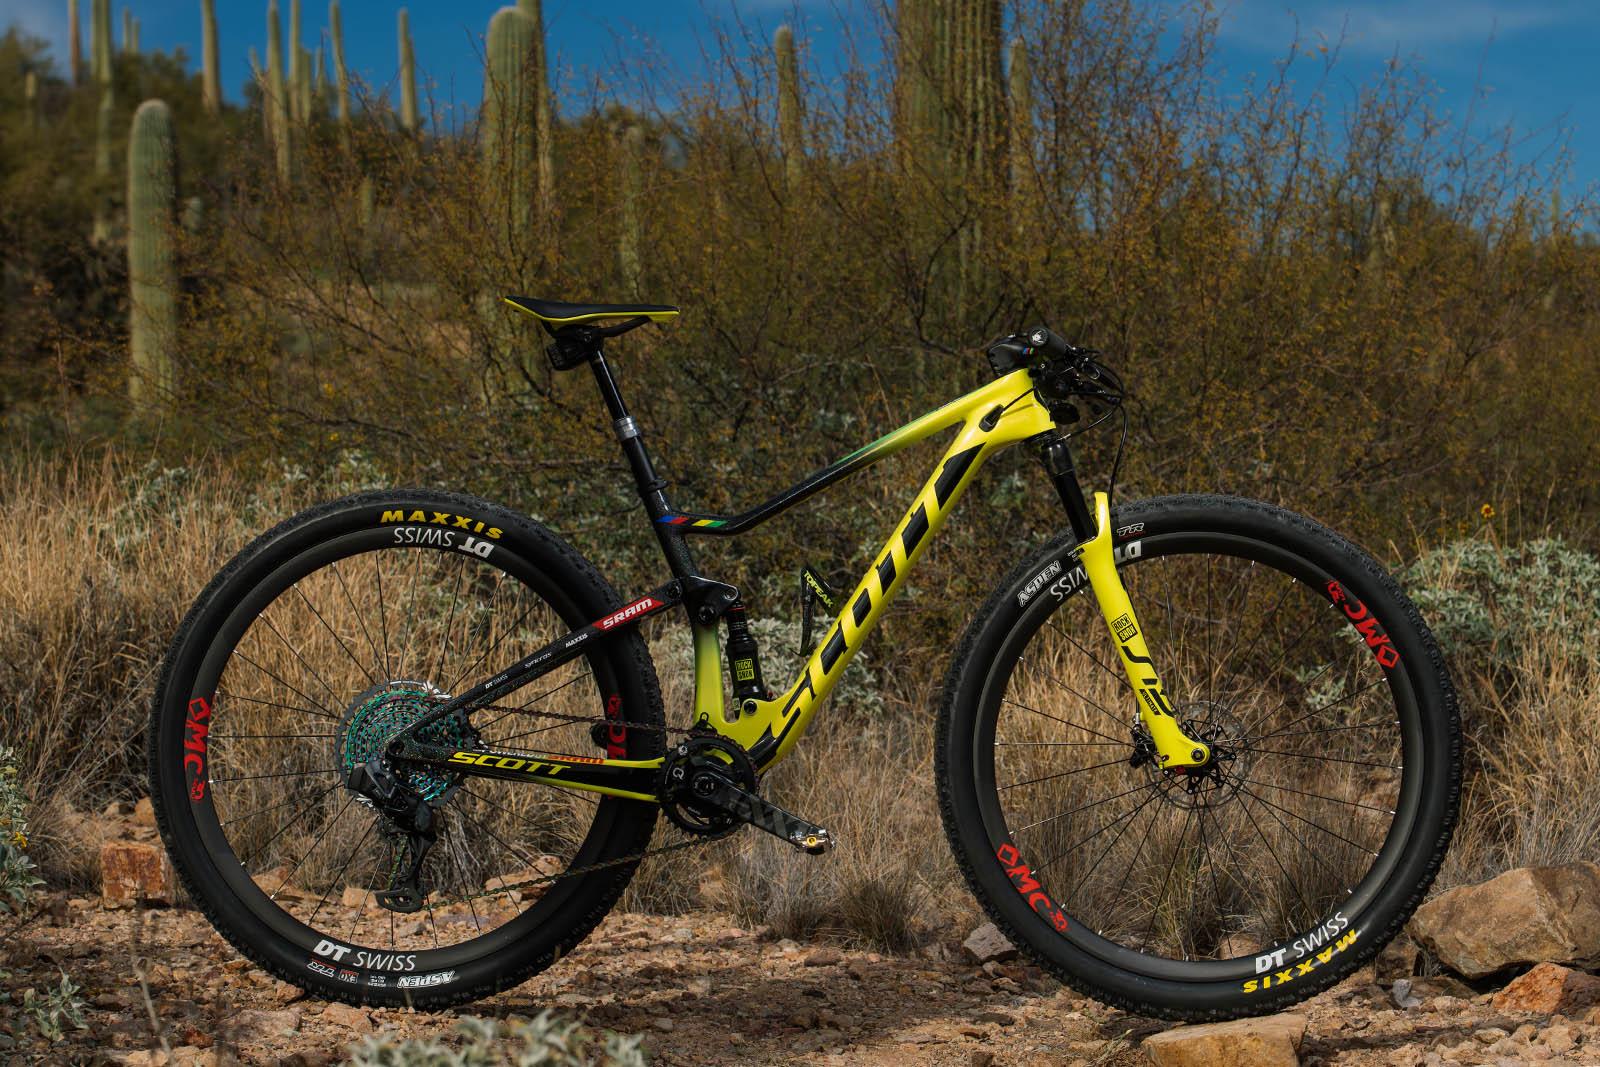 5e053159e77 spark-rc-side-nino-1600x1067-bike-2019-scott-